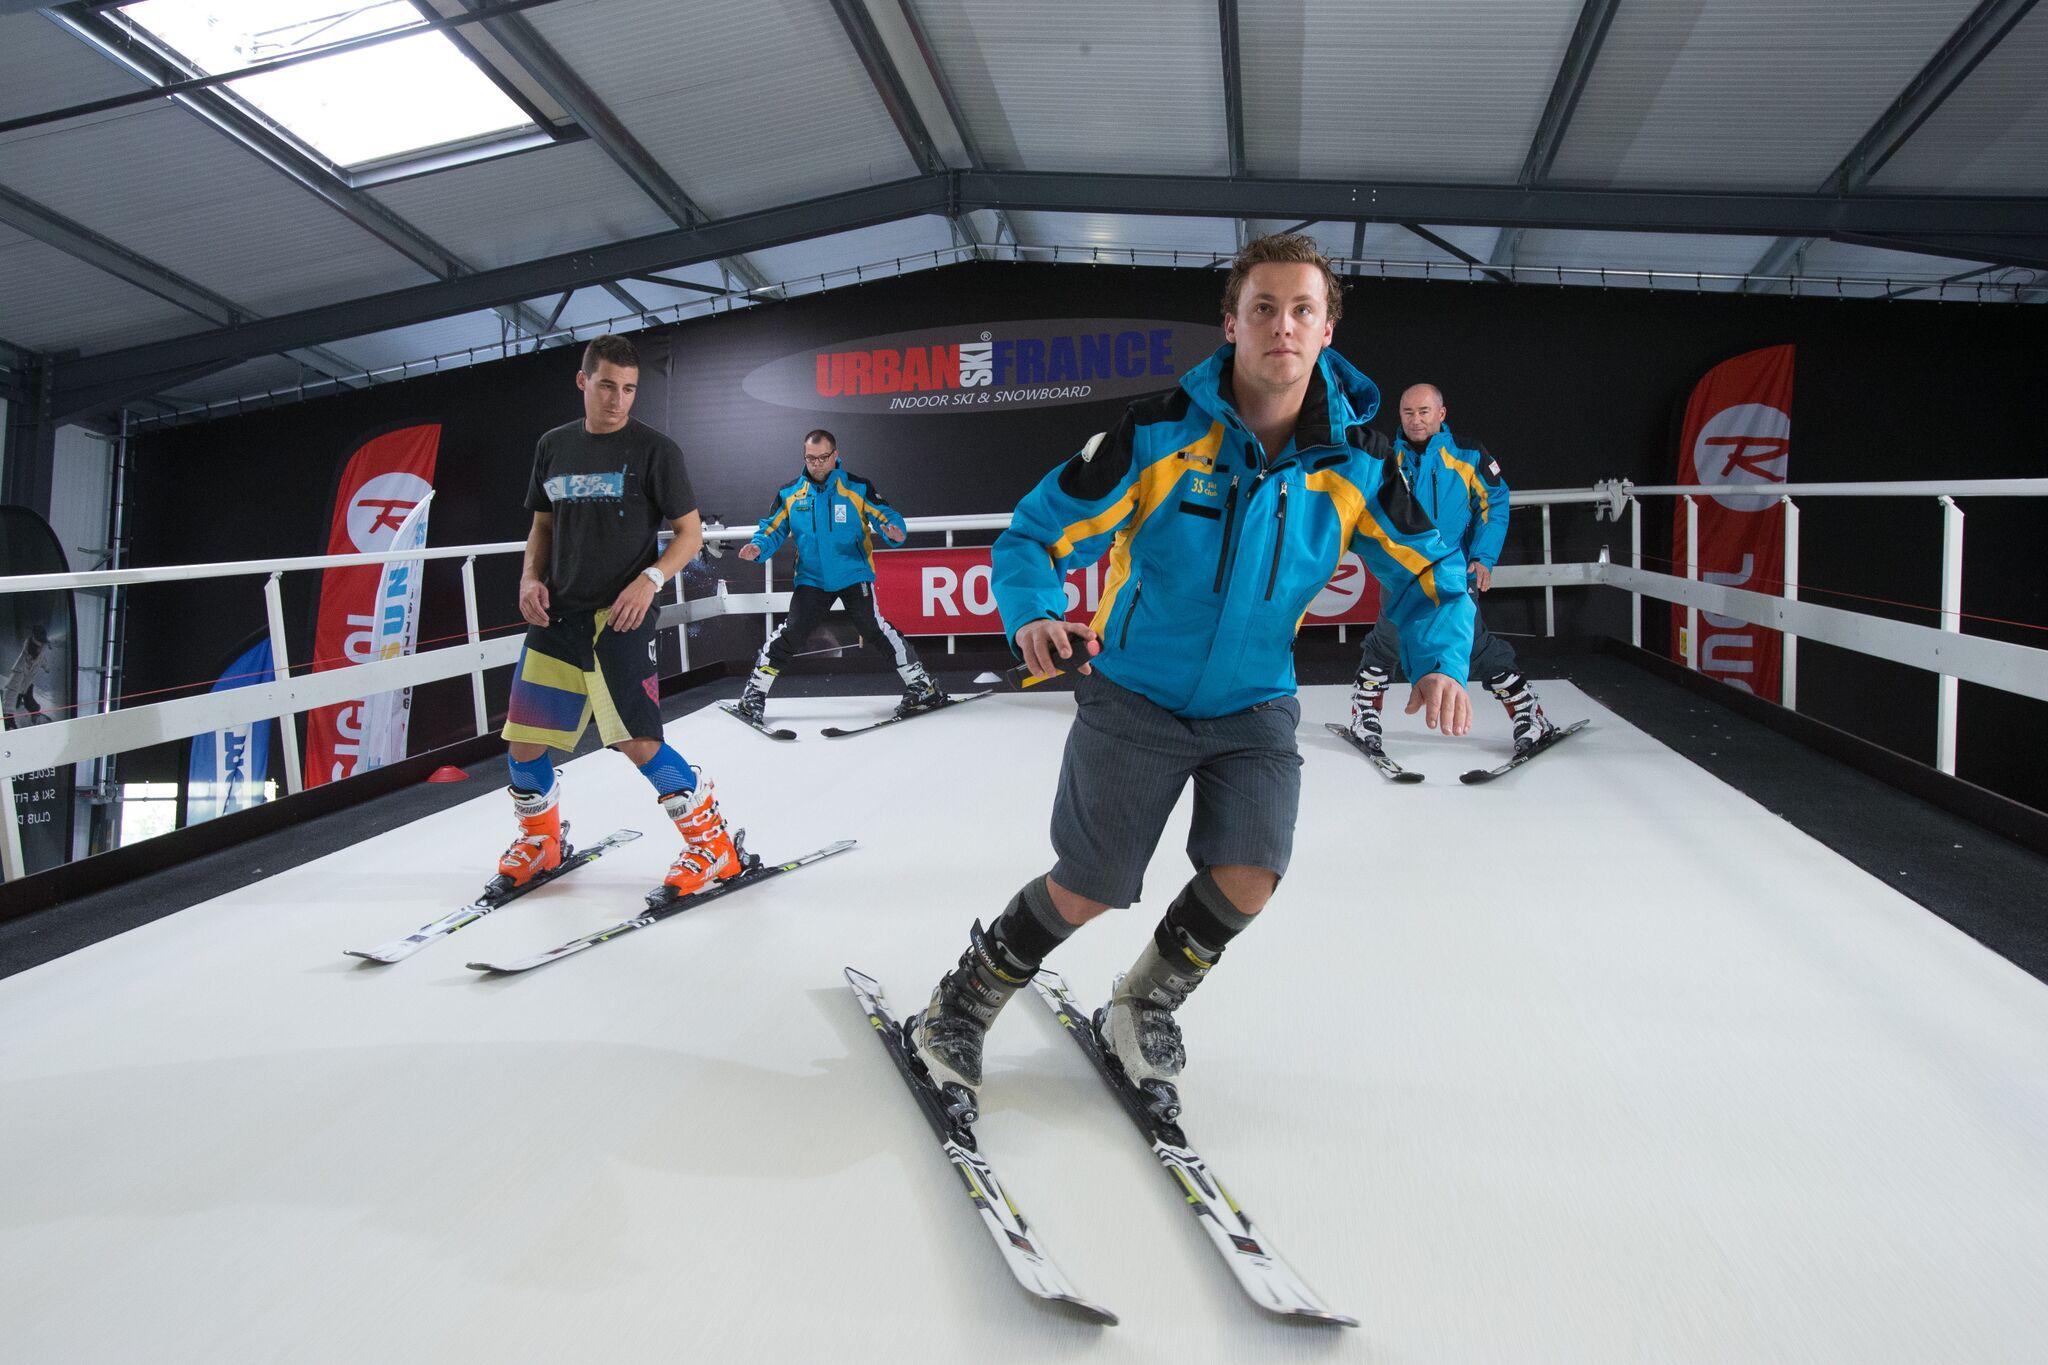 Urban ski France brut-2